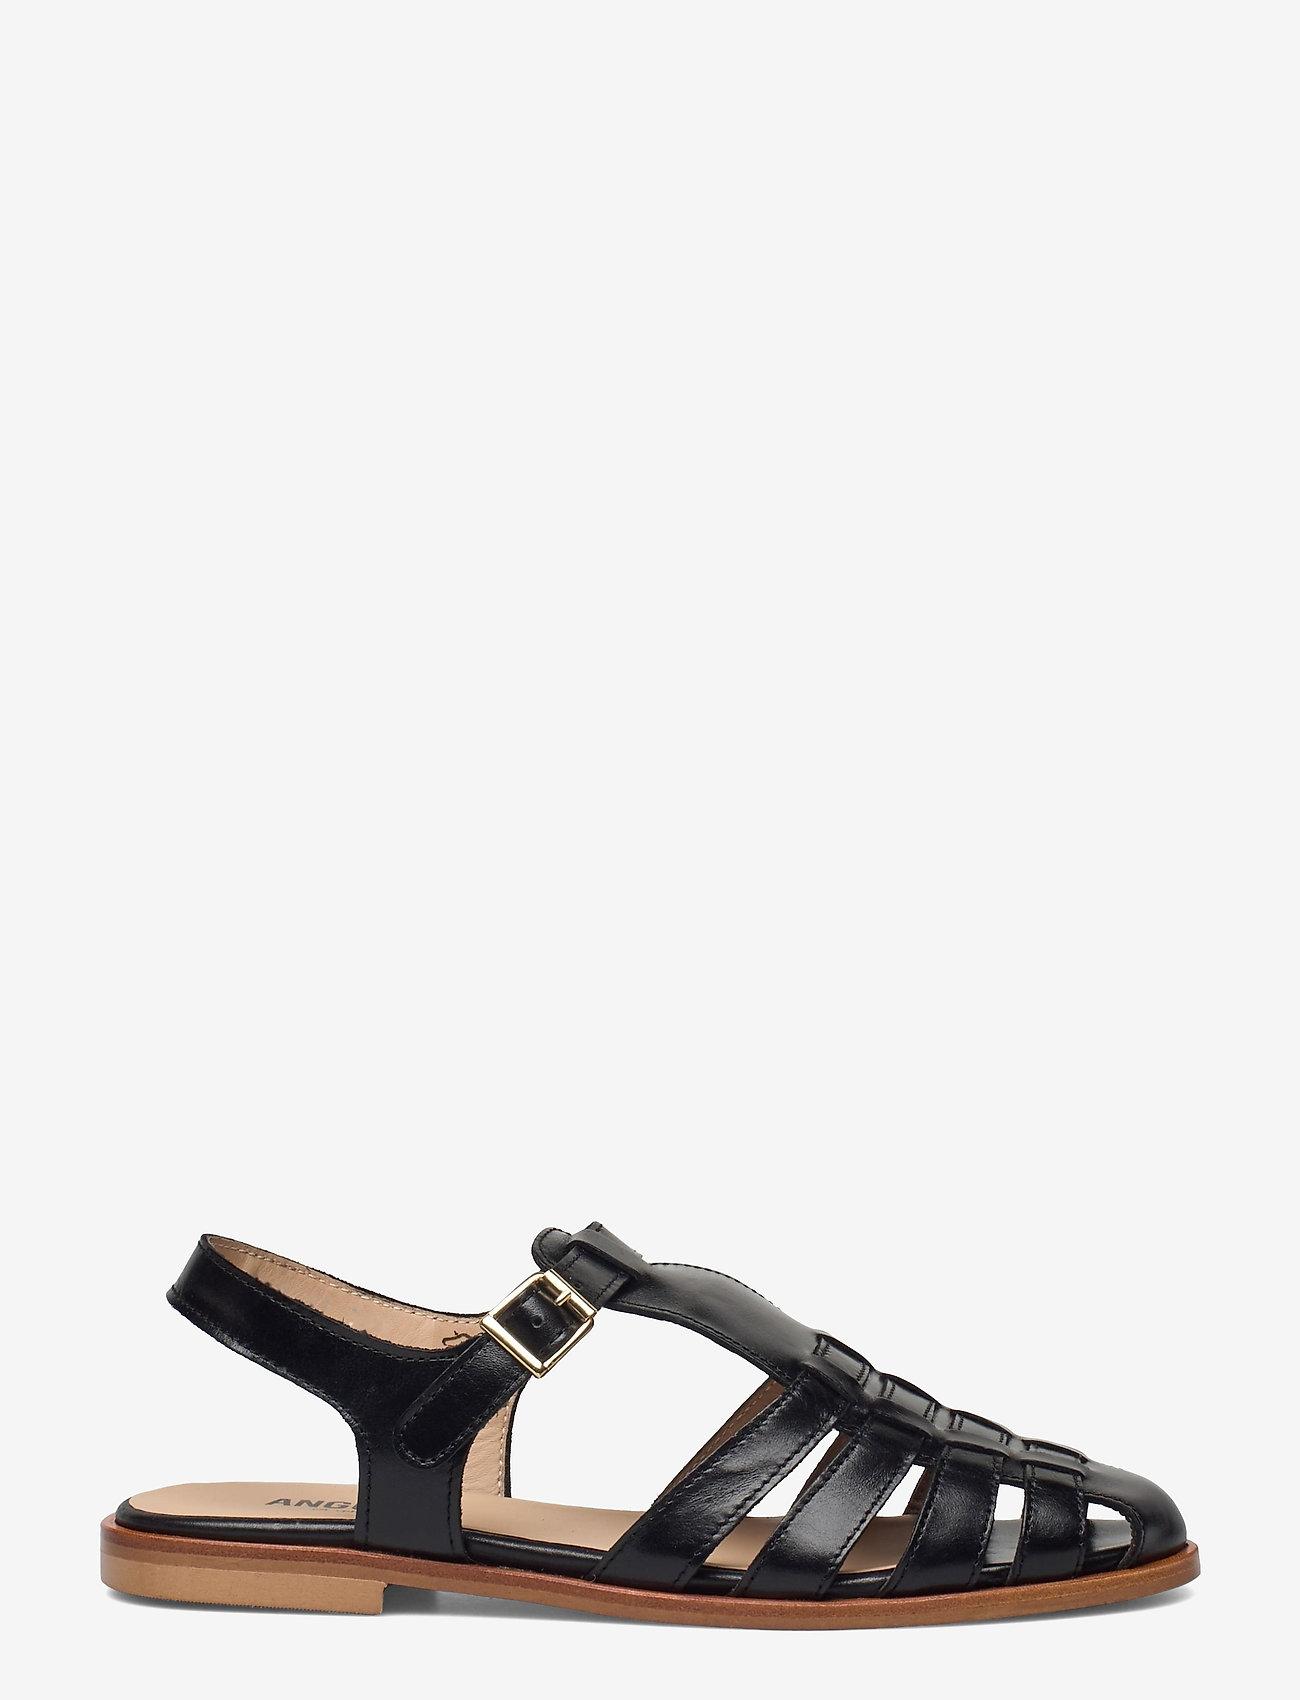 ANGULUS - Sandals - flat - closed toe - op - flache sandalen - 1835 black - 1